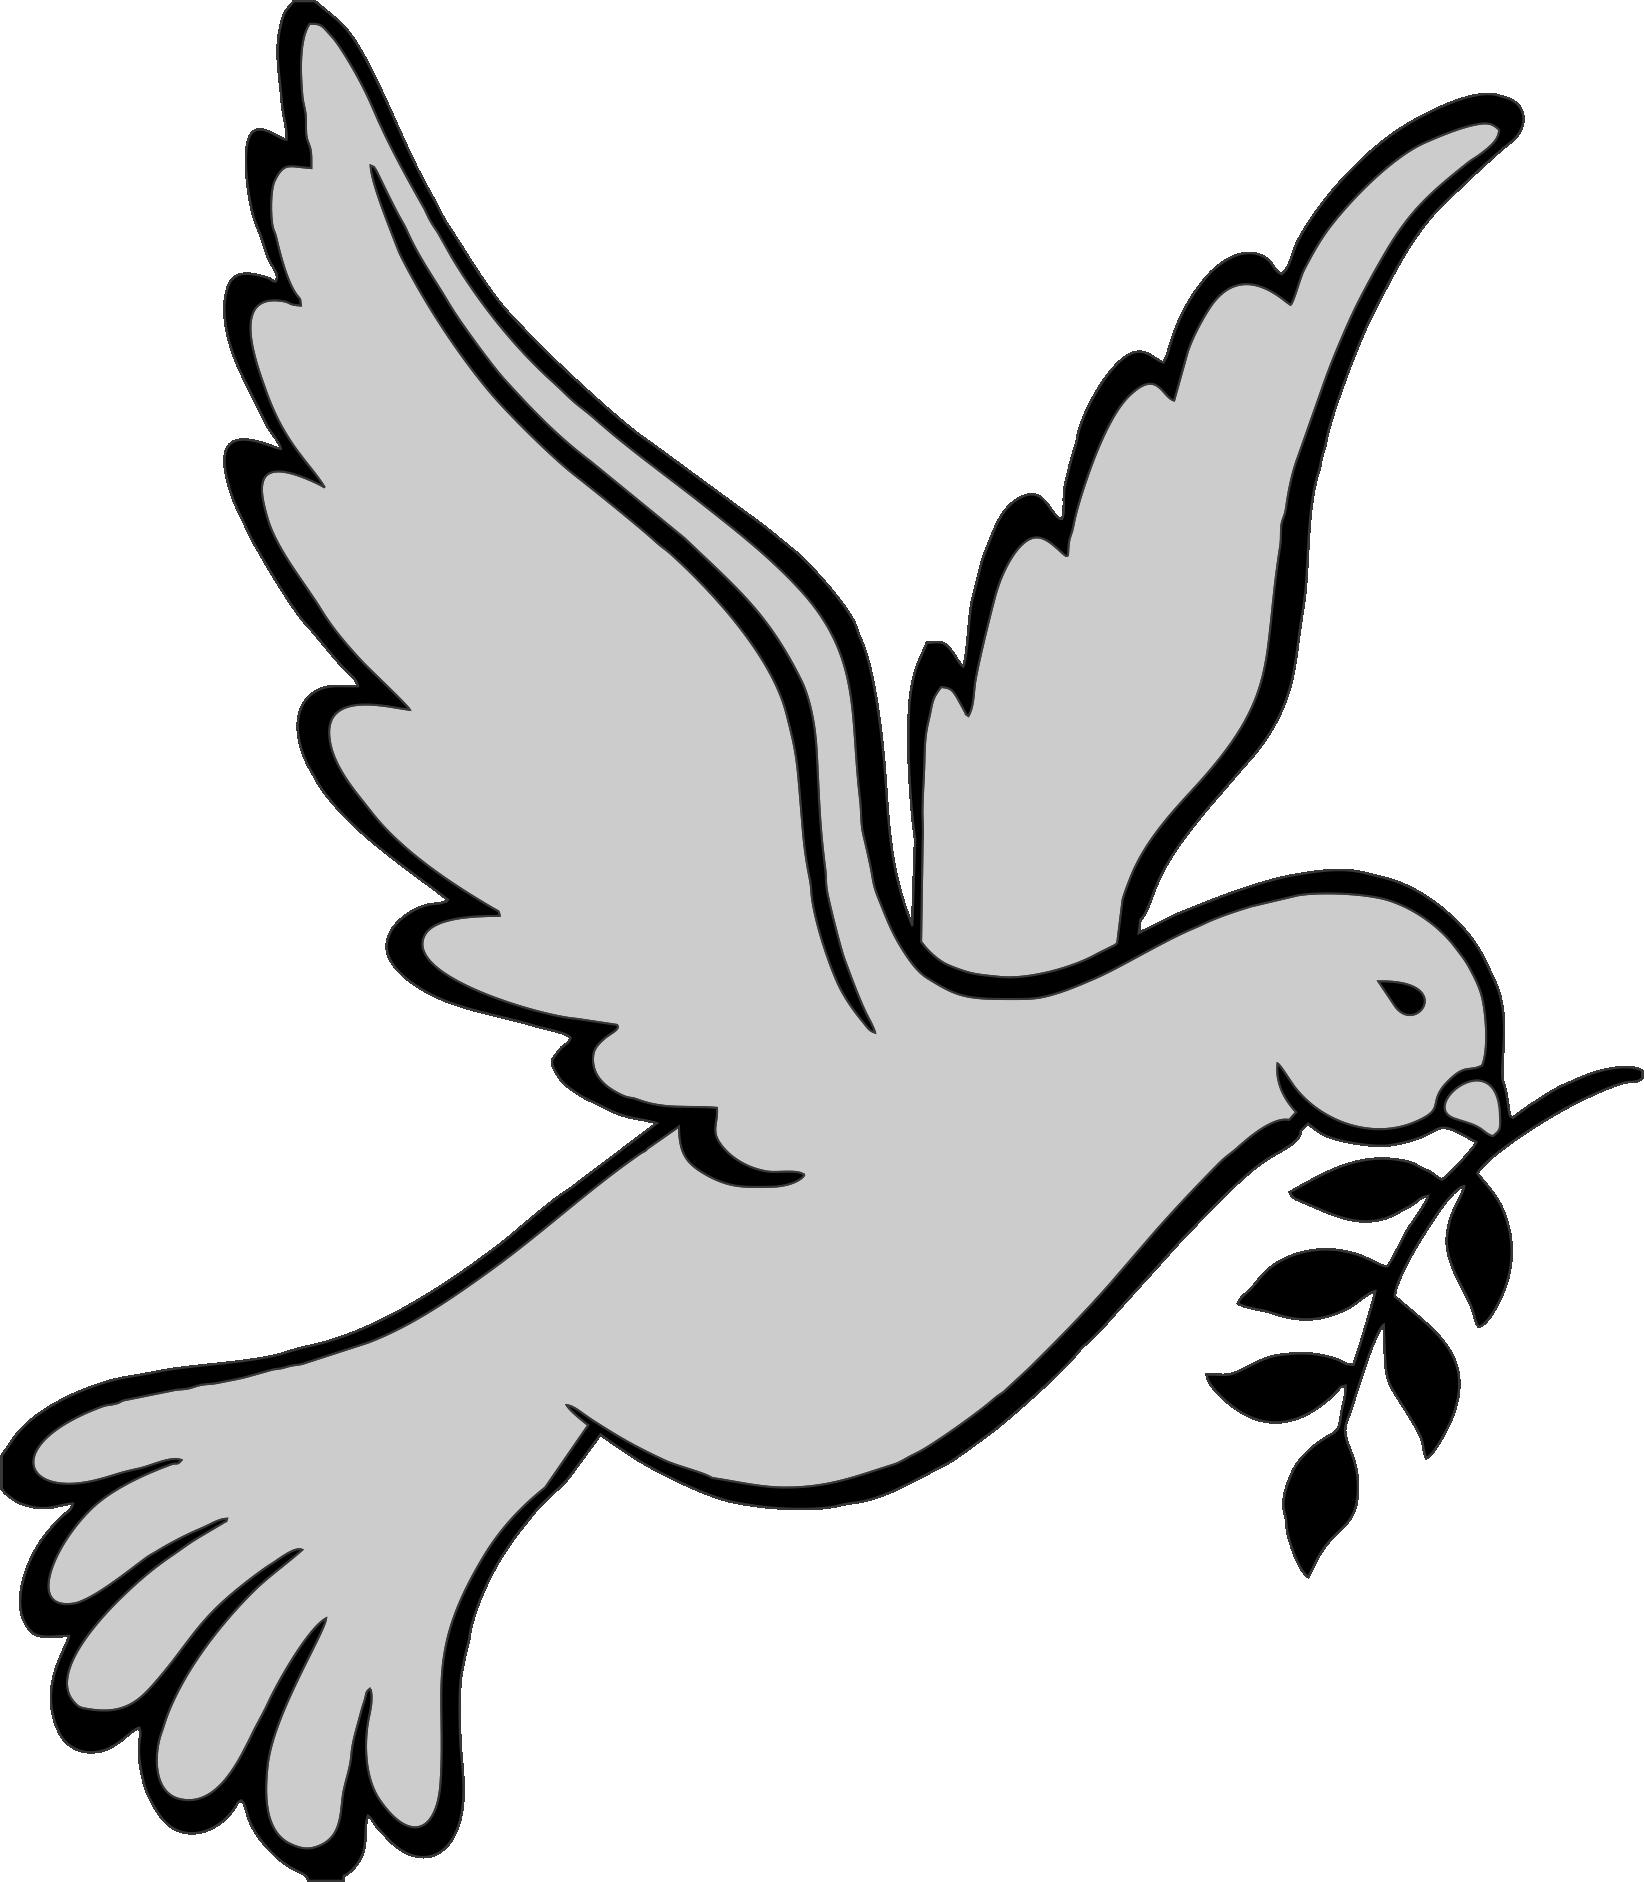 Headstone clipart bird. Dove free on dumielauxepices